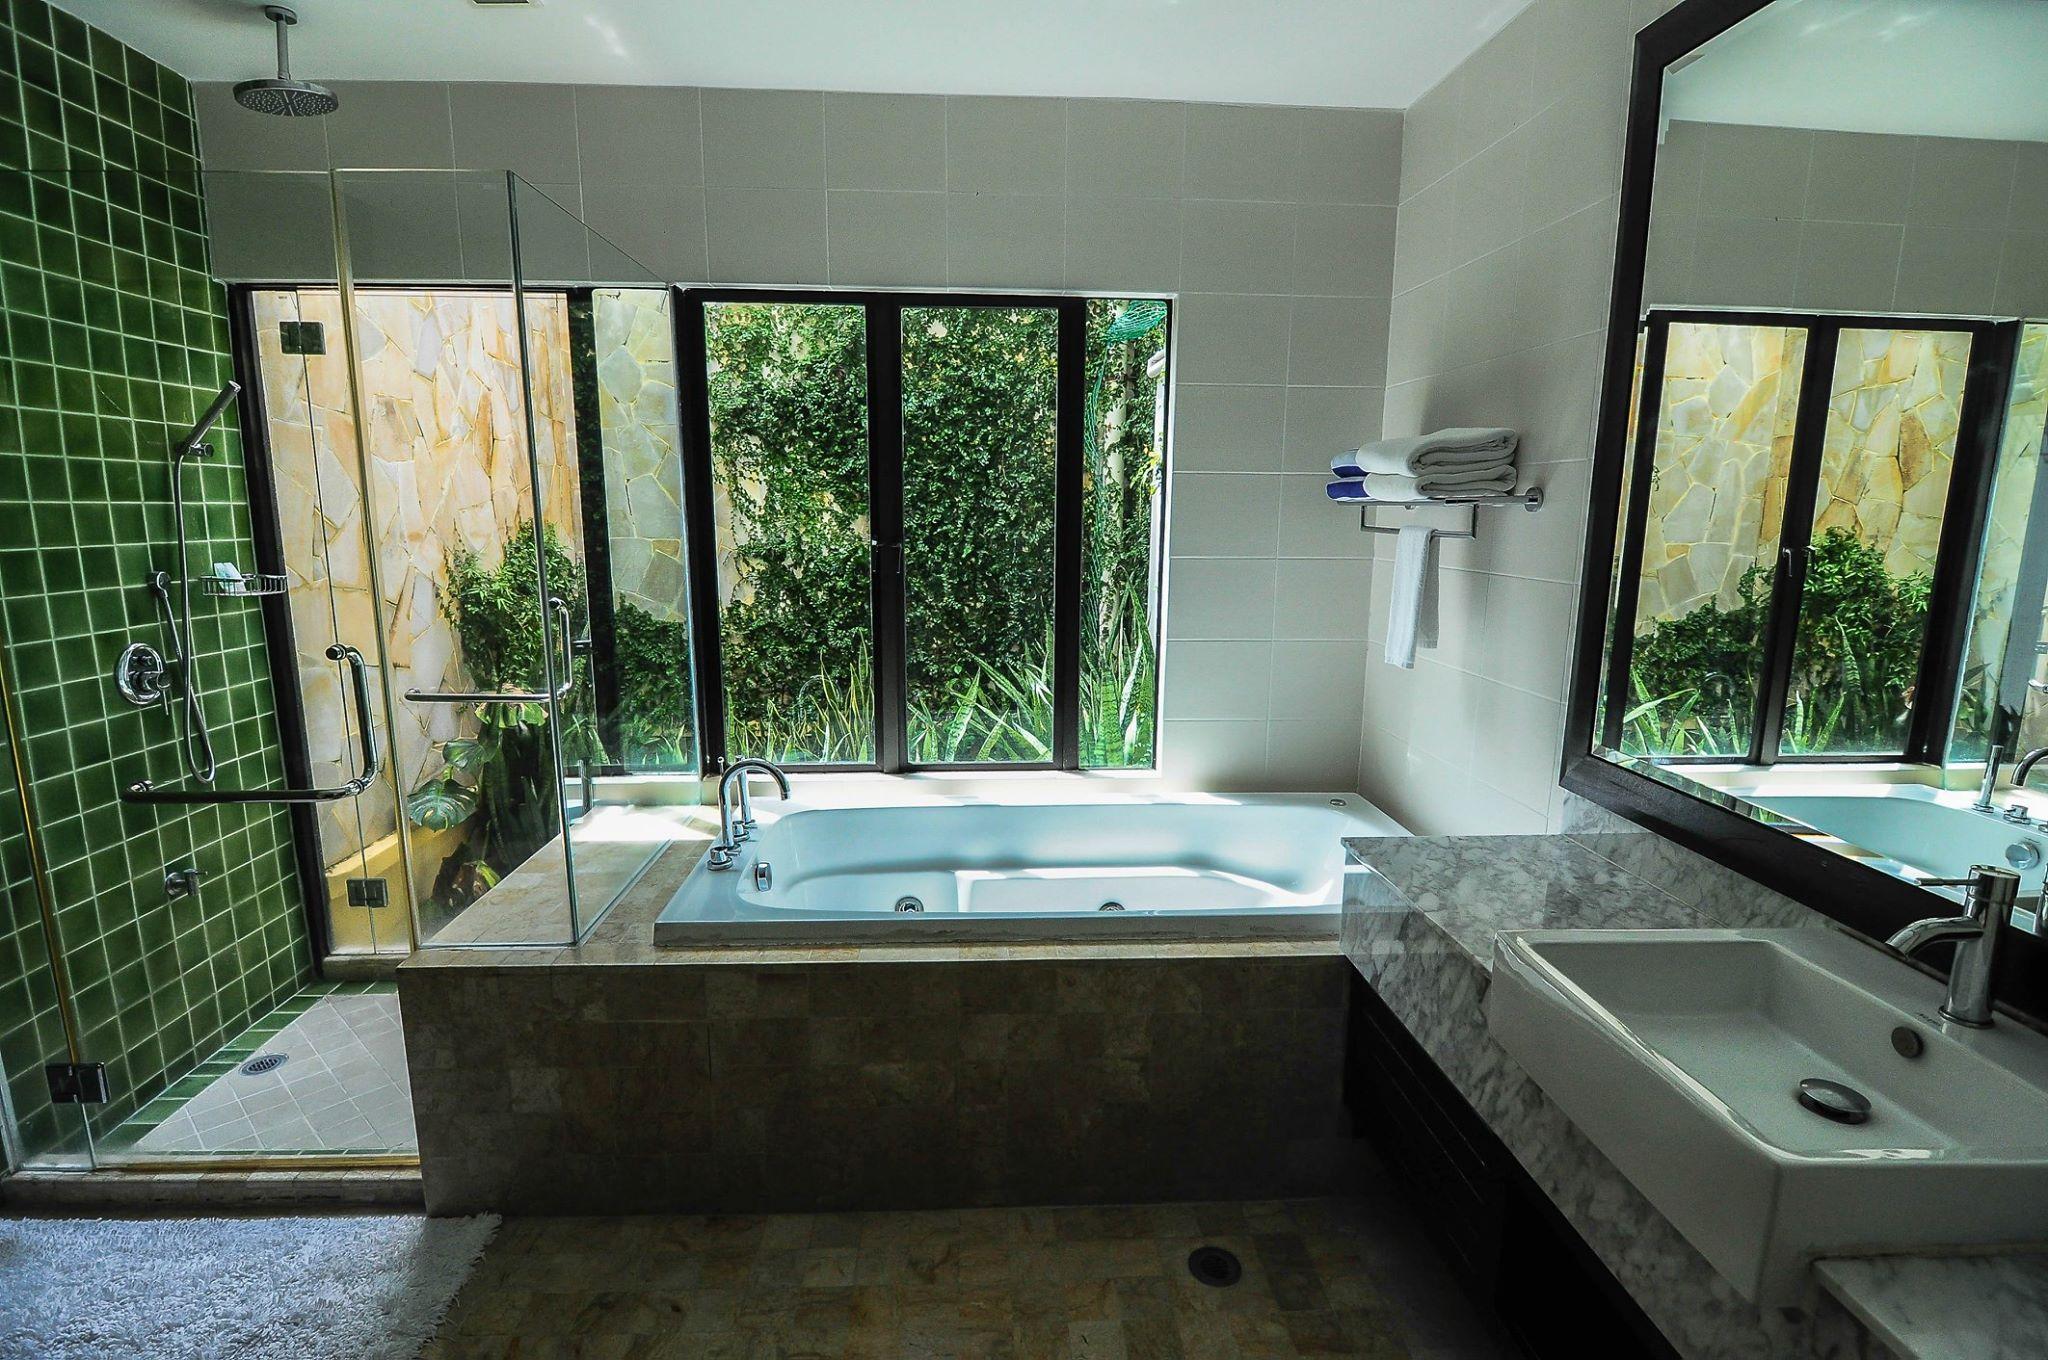 kota kinabalu resorts and hotels - borneo beach villas jacuzzi